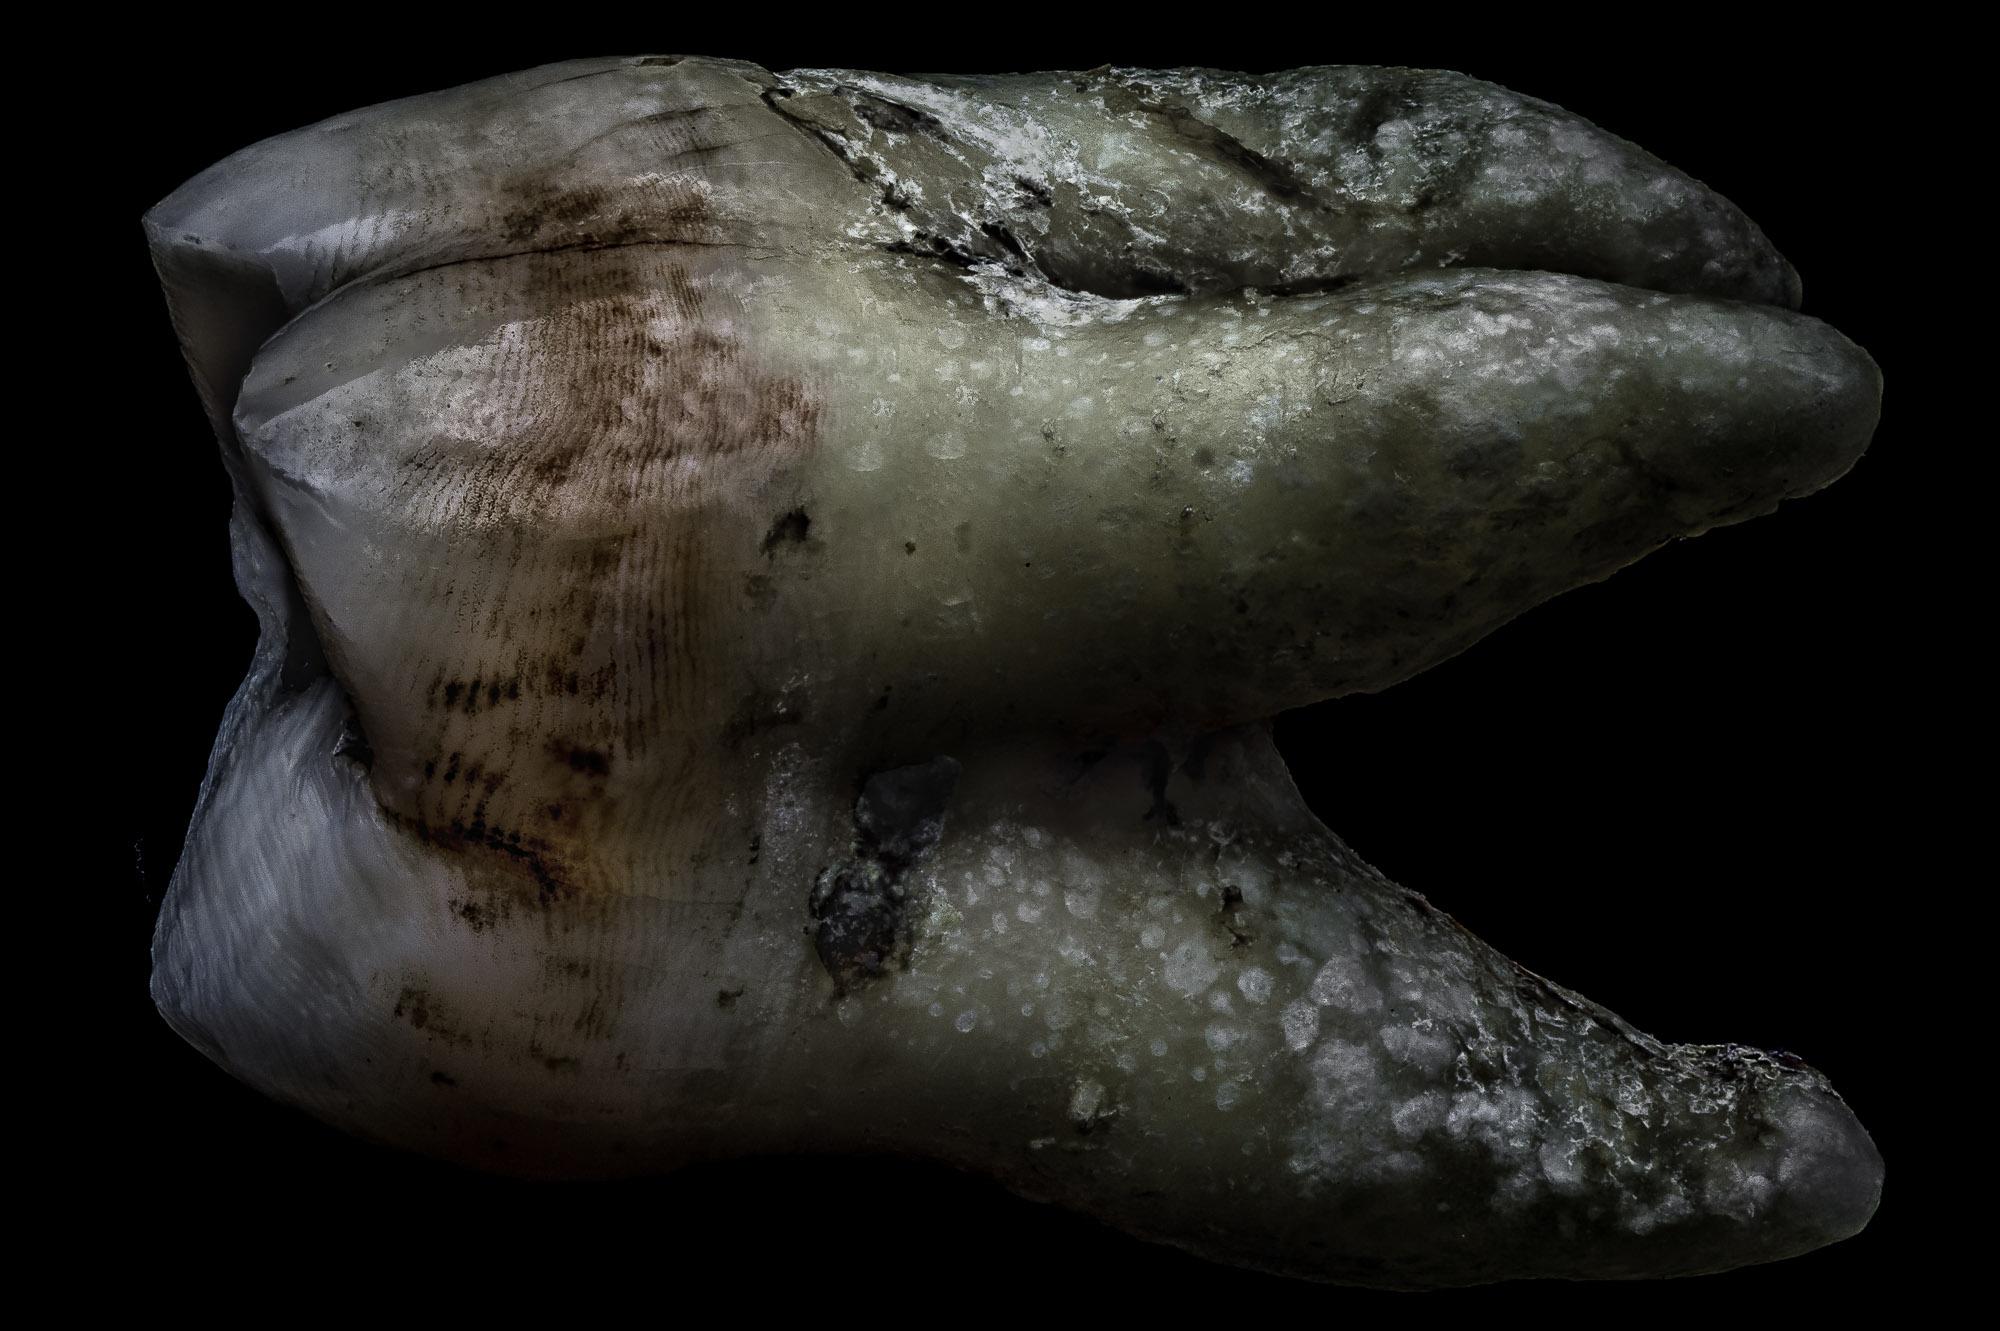 neal-auch-human-teeth-photographs-3.jpg